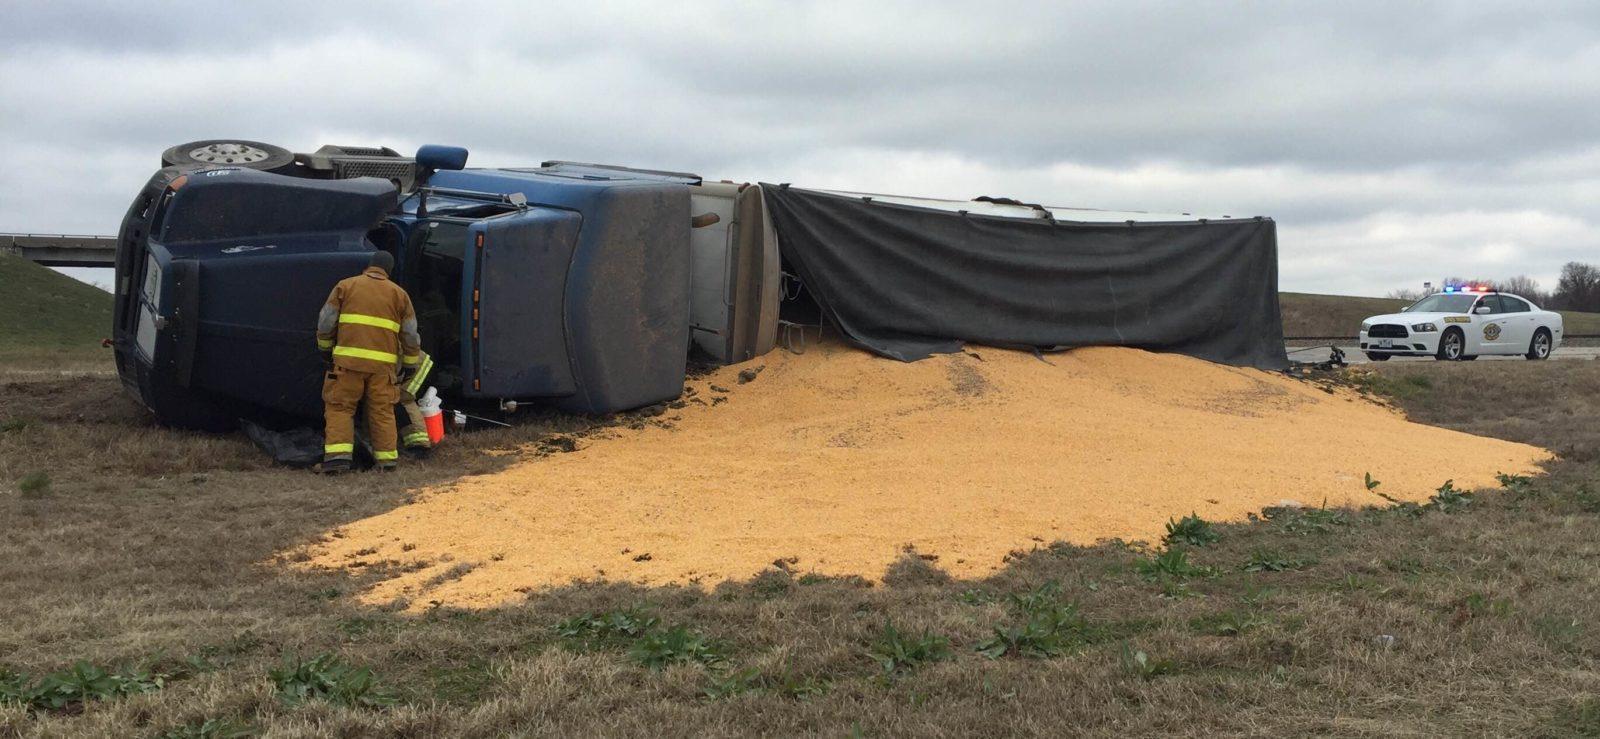 DEVELOPING: Semi-trailer overturned at 65 Highway, 10 Highway junction